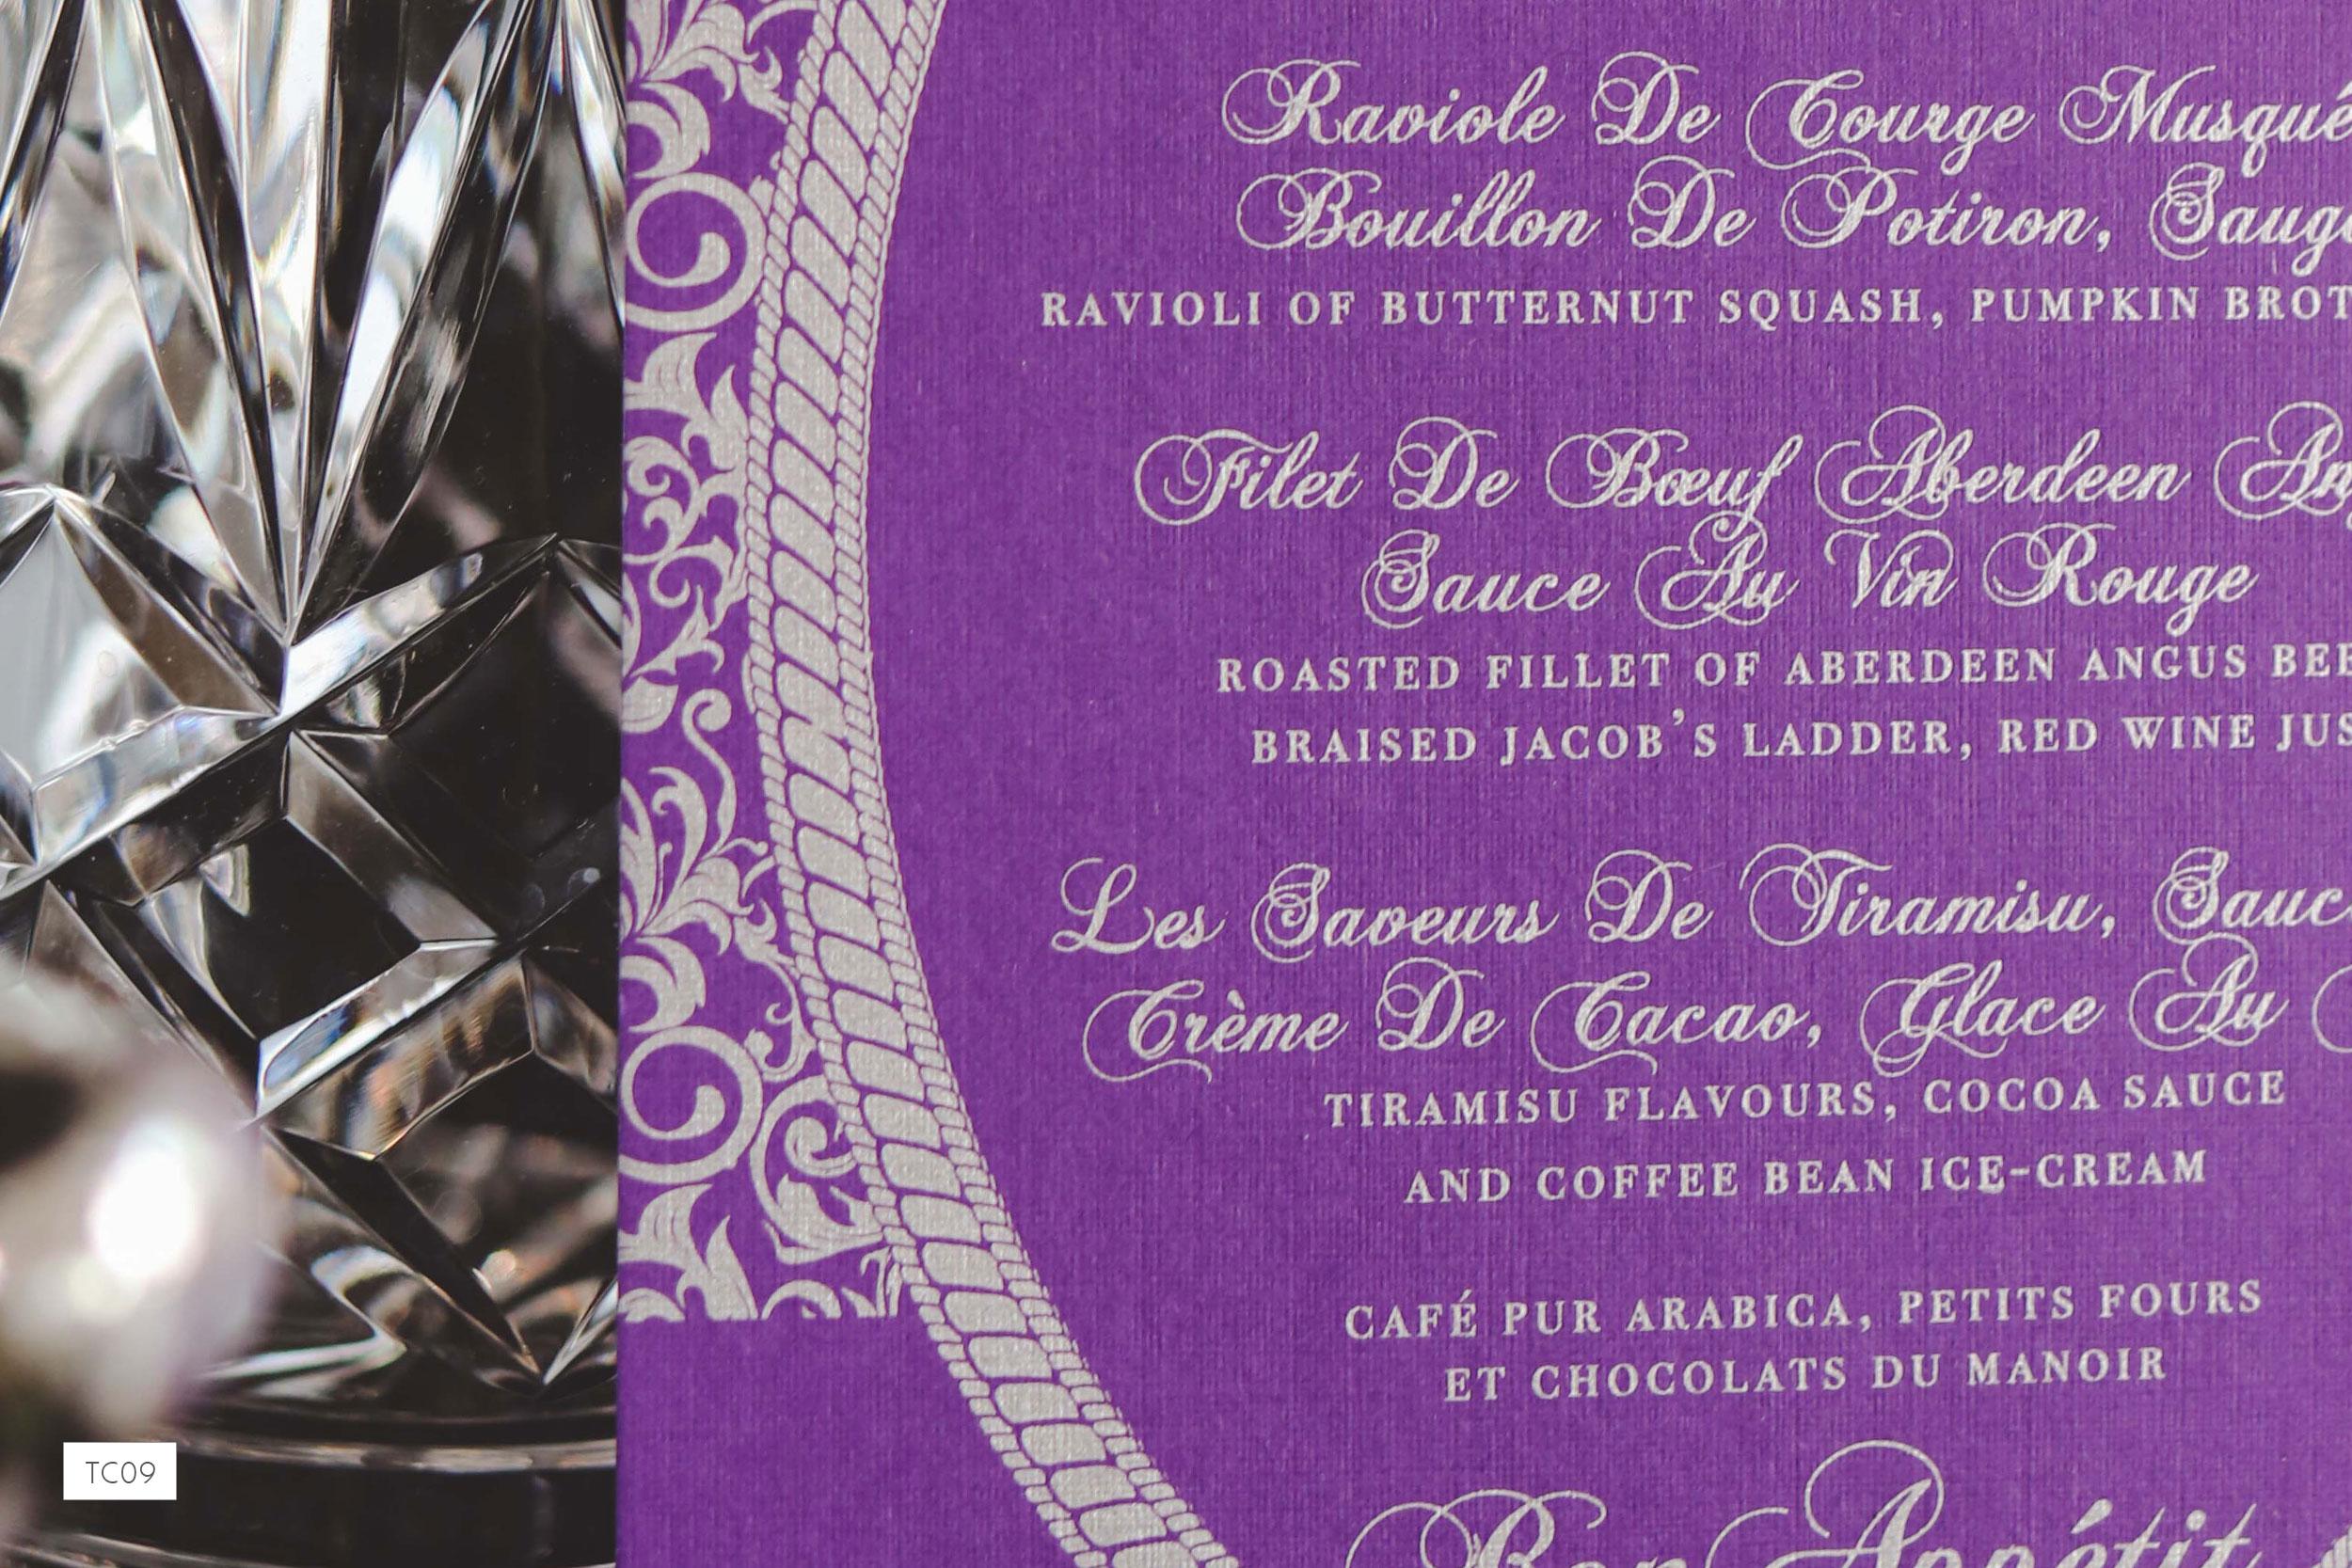 tc09-wedding-menu-3.jpg